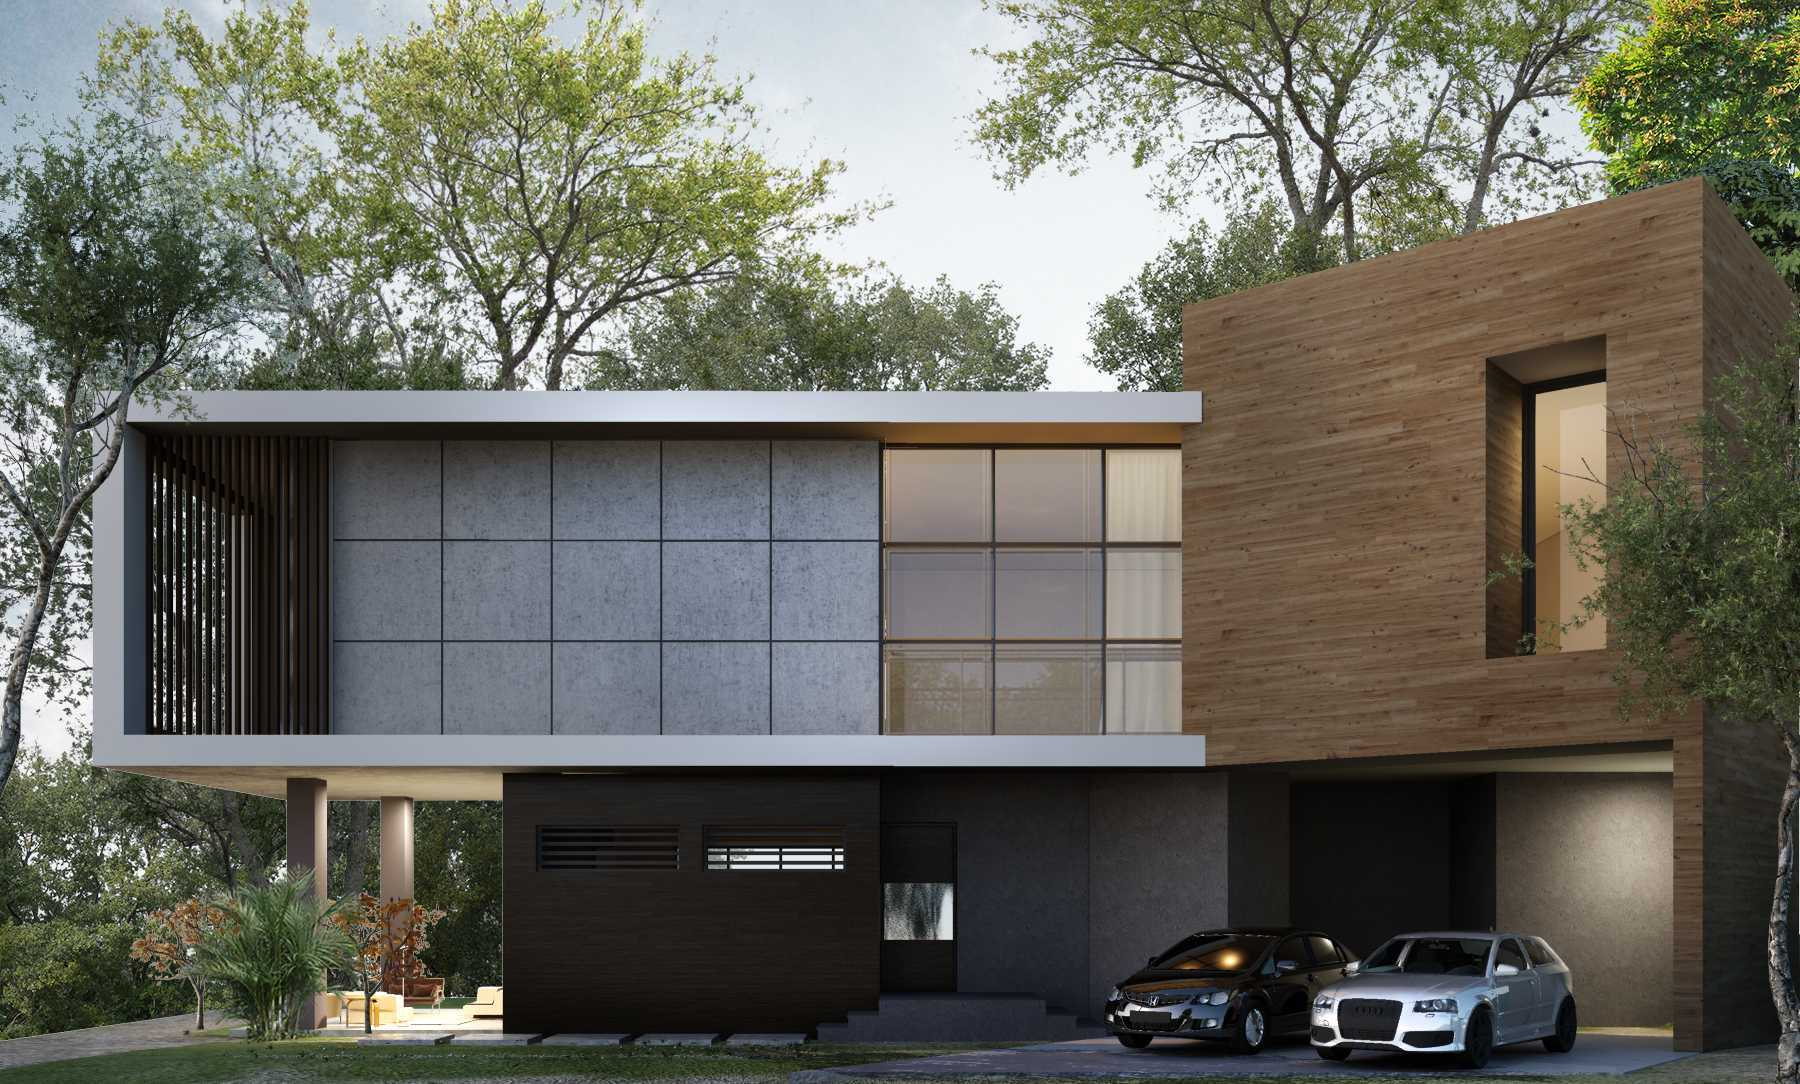 Small Space Interior Tropical Modern House Batam Batam Facade-1 Modern,tropis,wood  13350